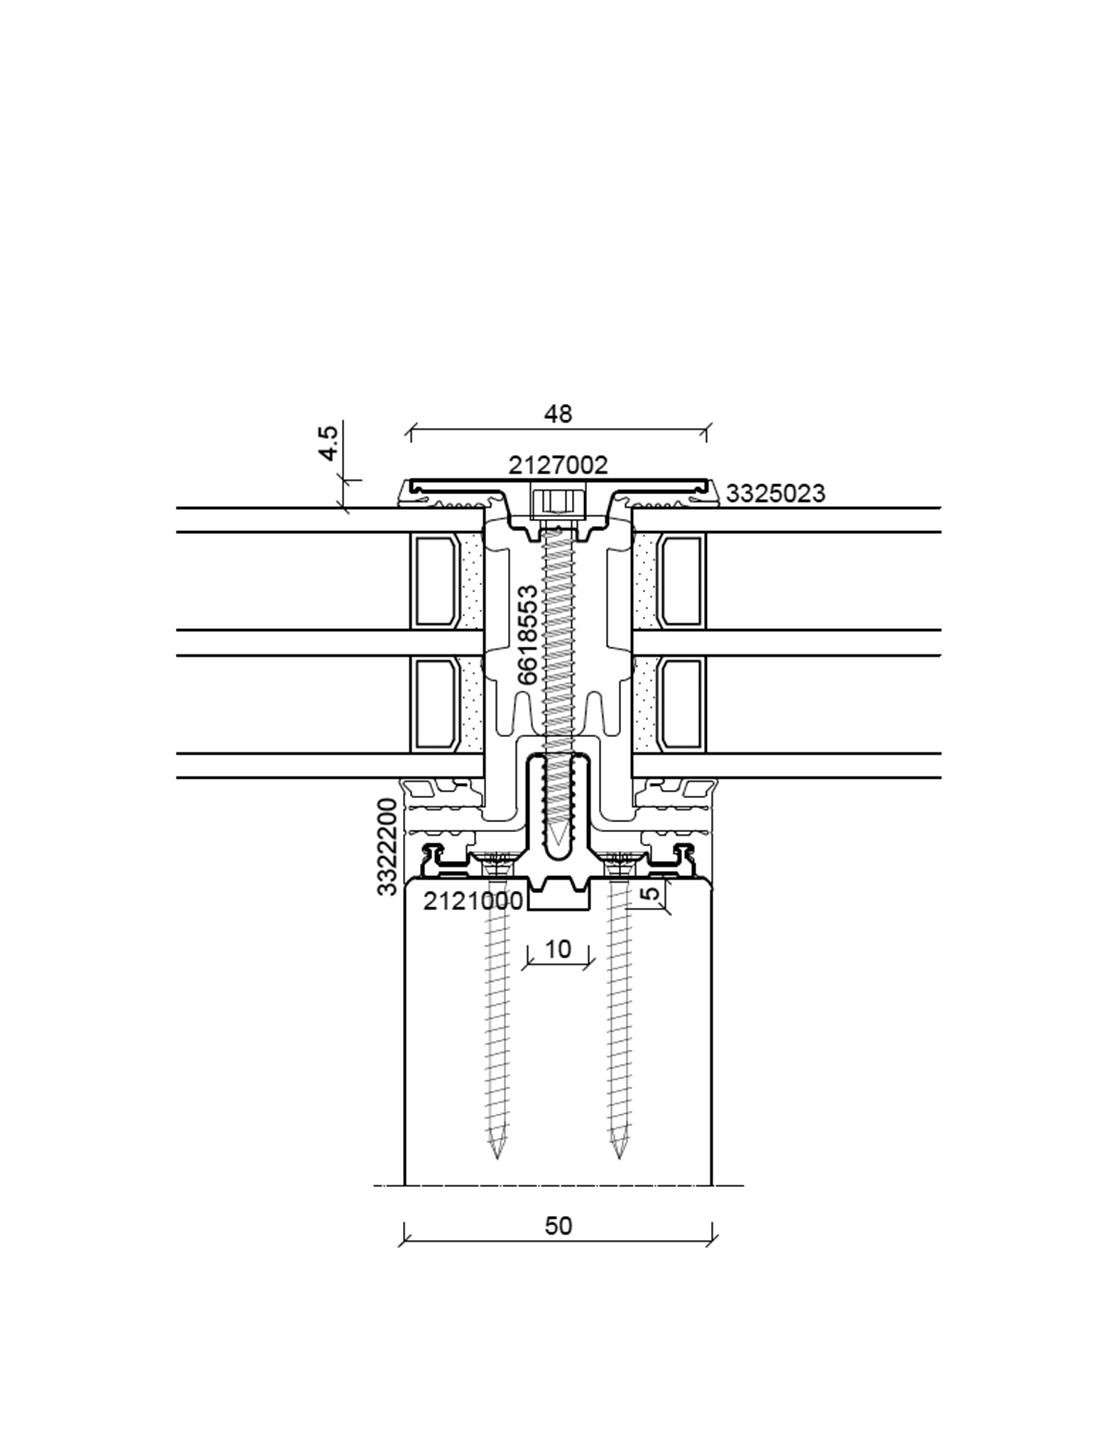 batimet holz aluminium pfosten riegel tm50 se sg. Black Bedroom Furniture Sets. Home Design Ideas